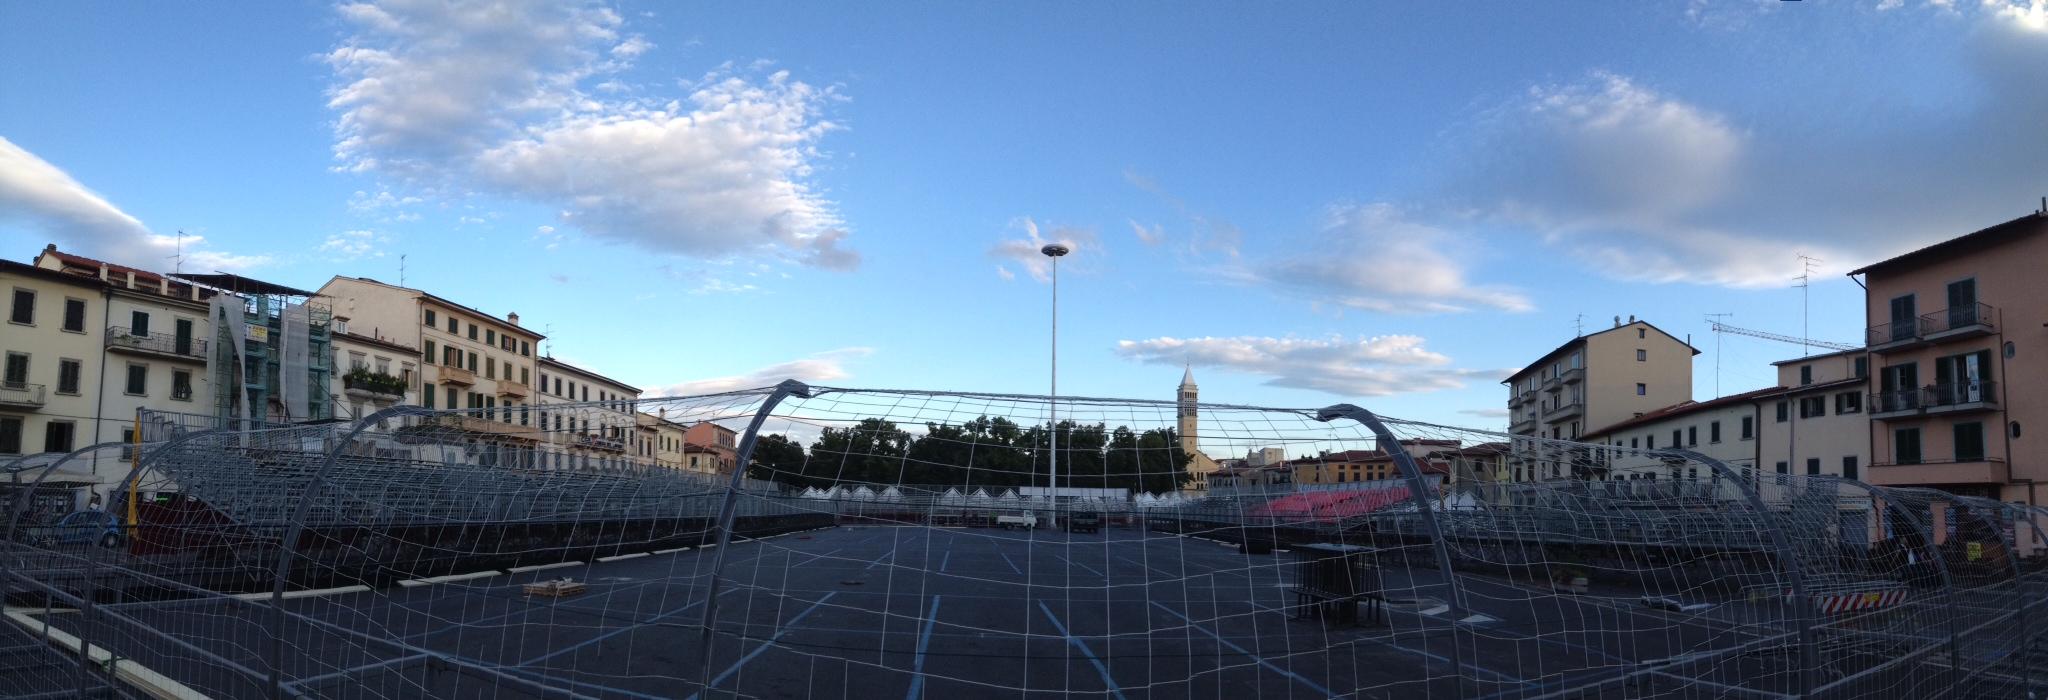 panoramica_mercatale